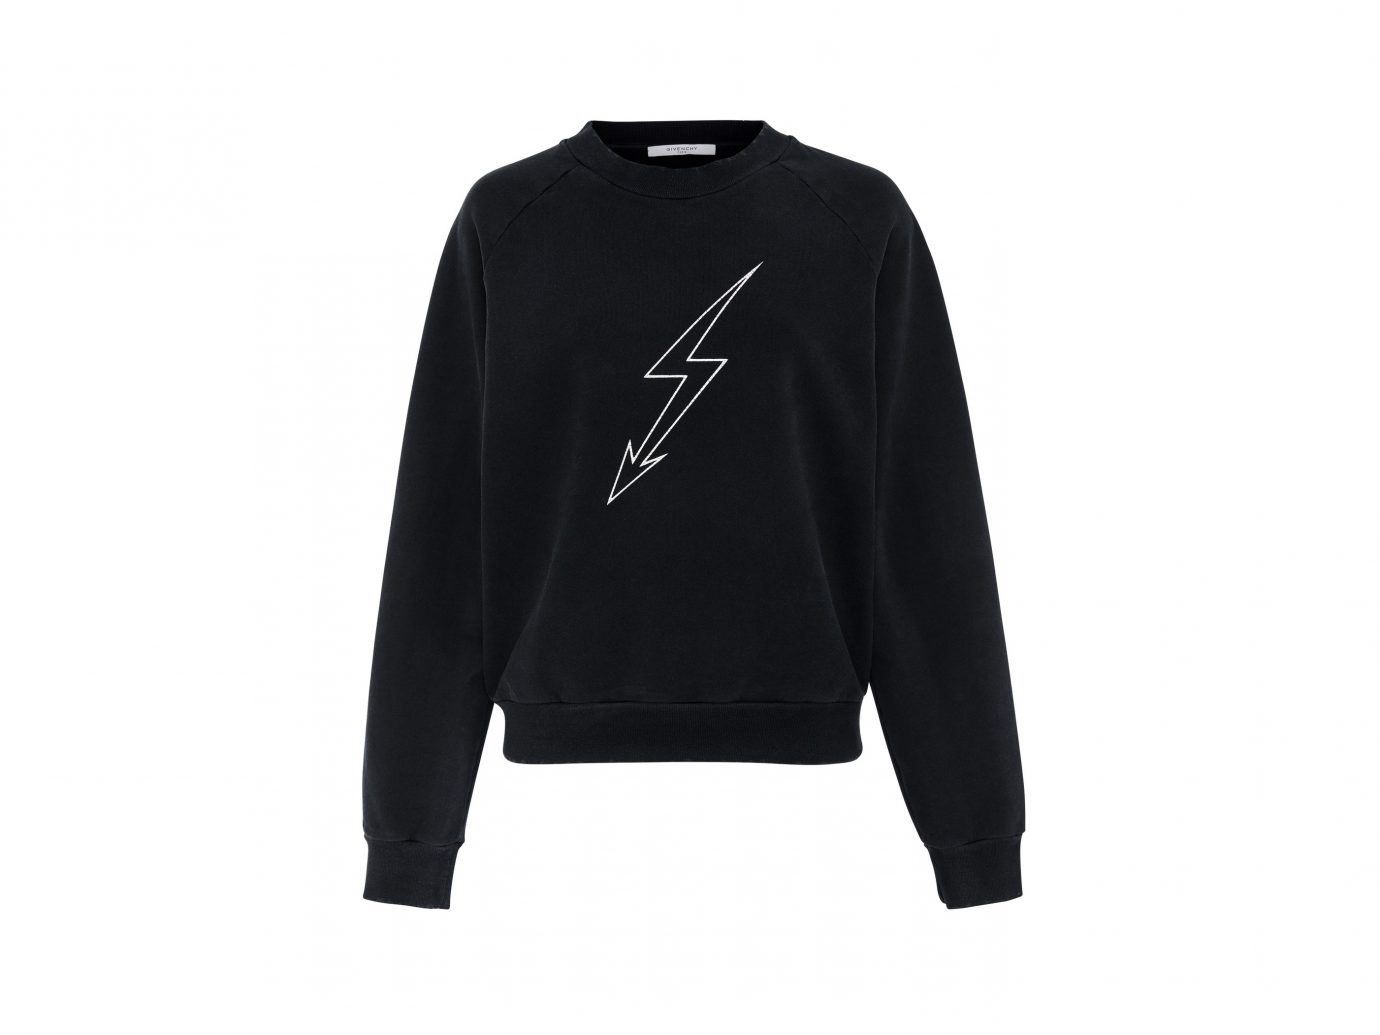 best sweatshirts,Givenchy Lightning Bolt Cotton-Jersey Sweatshirt